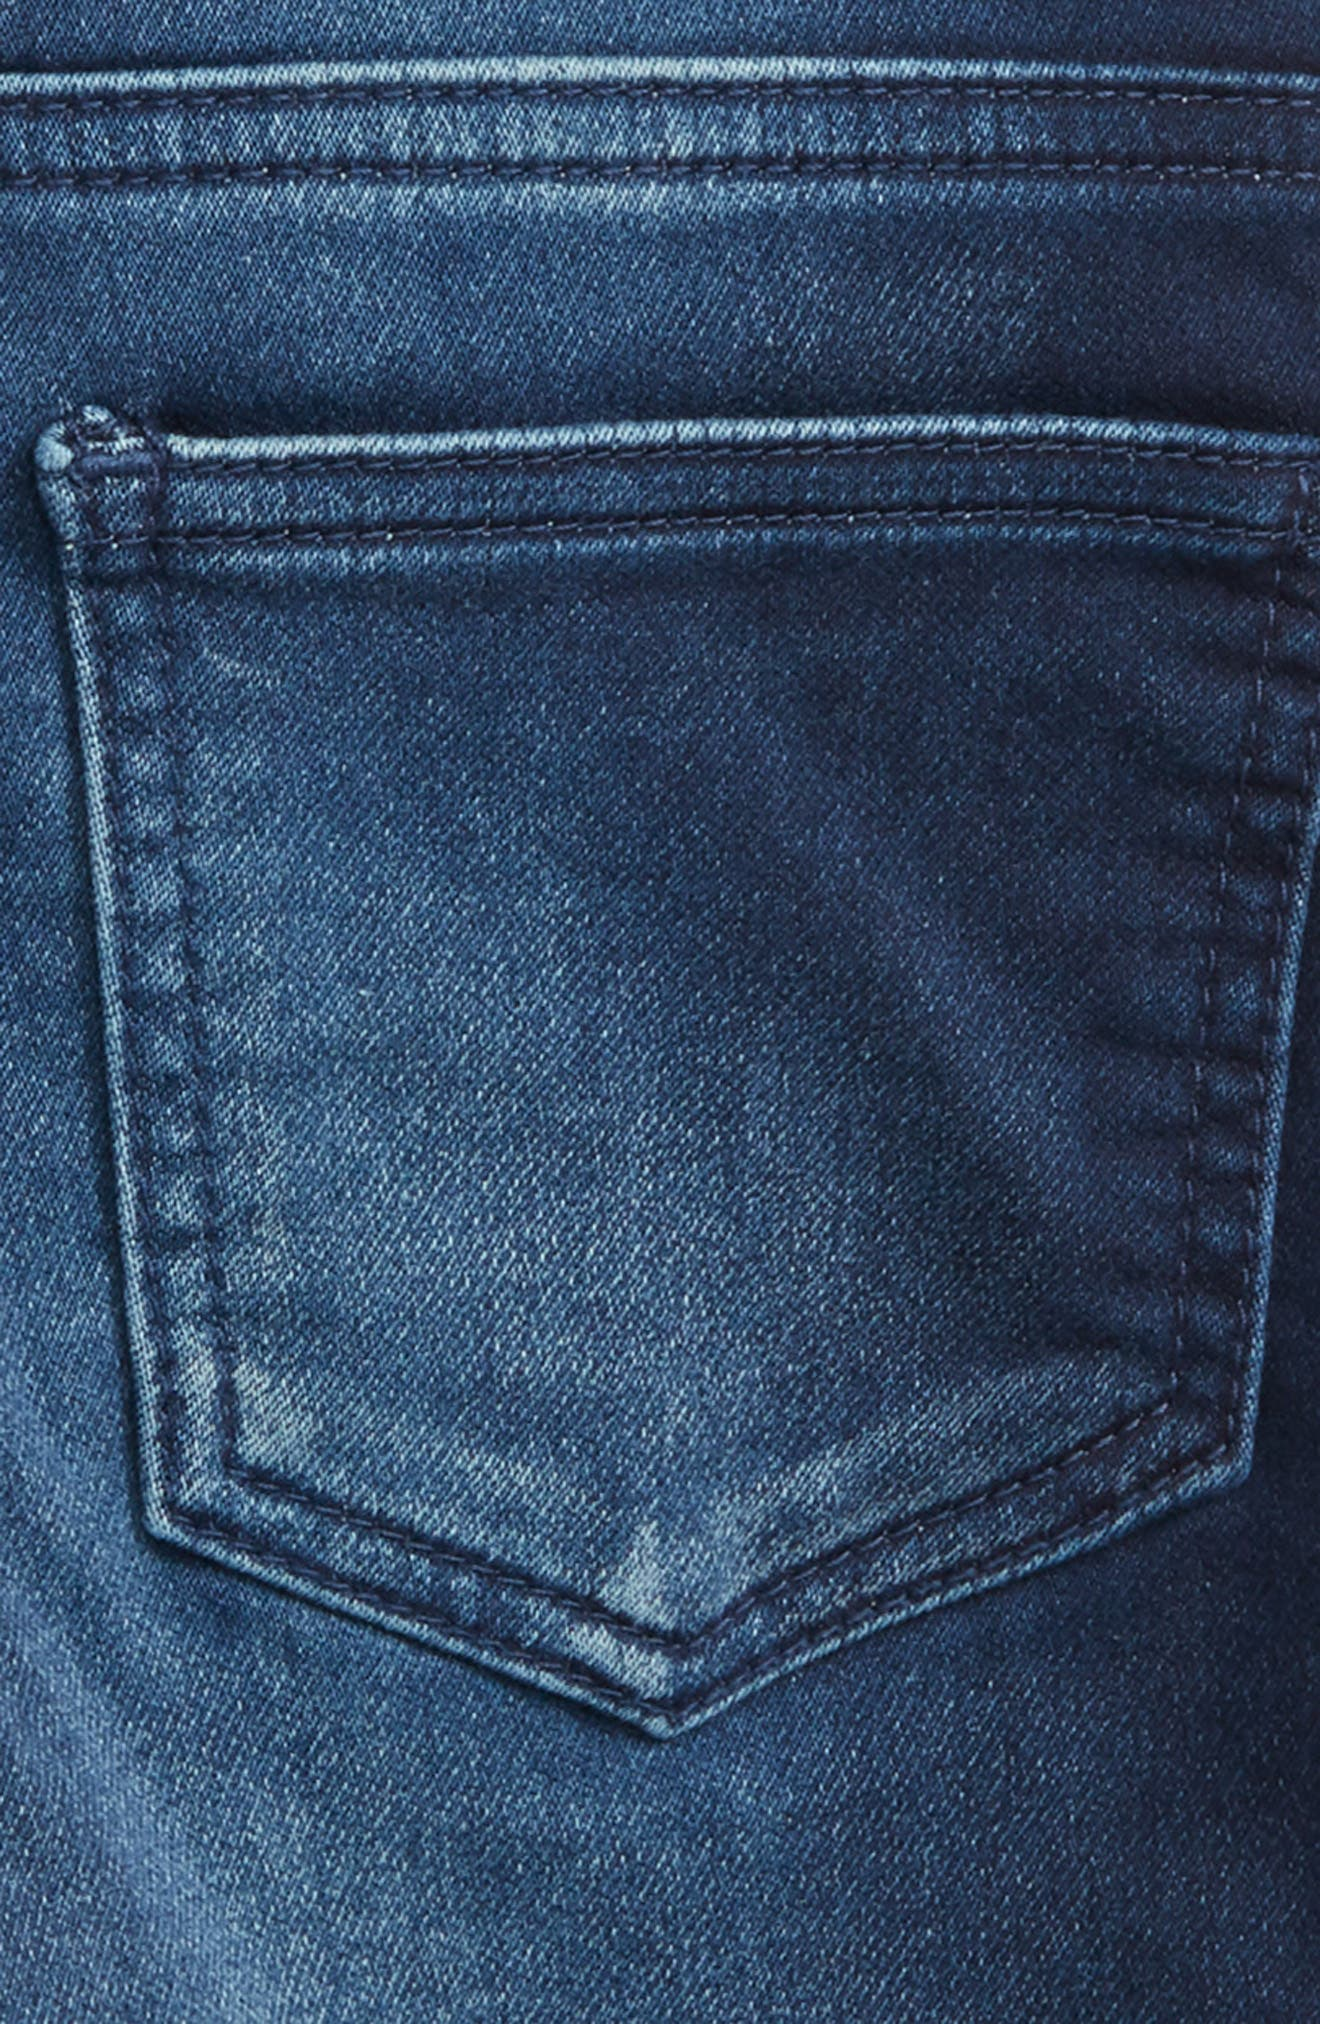 Carl Denim Shorts,                             Alternate thumbnail 3, color,                             Blue